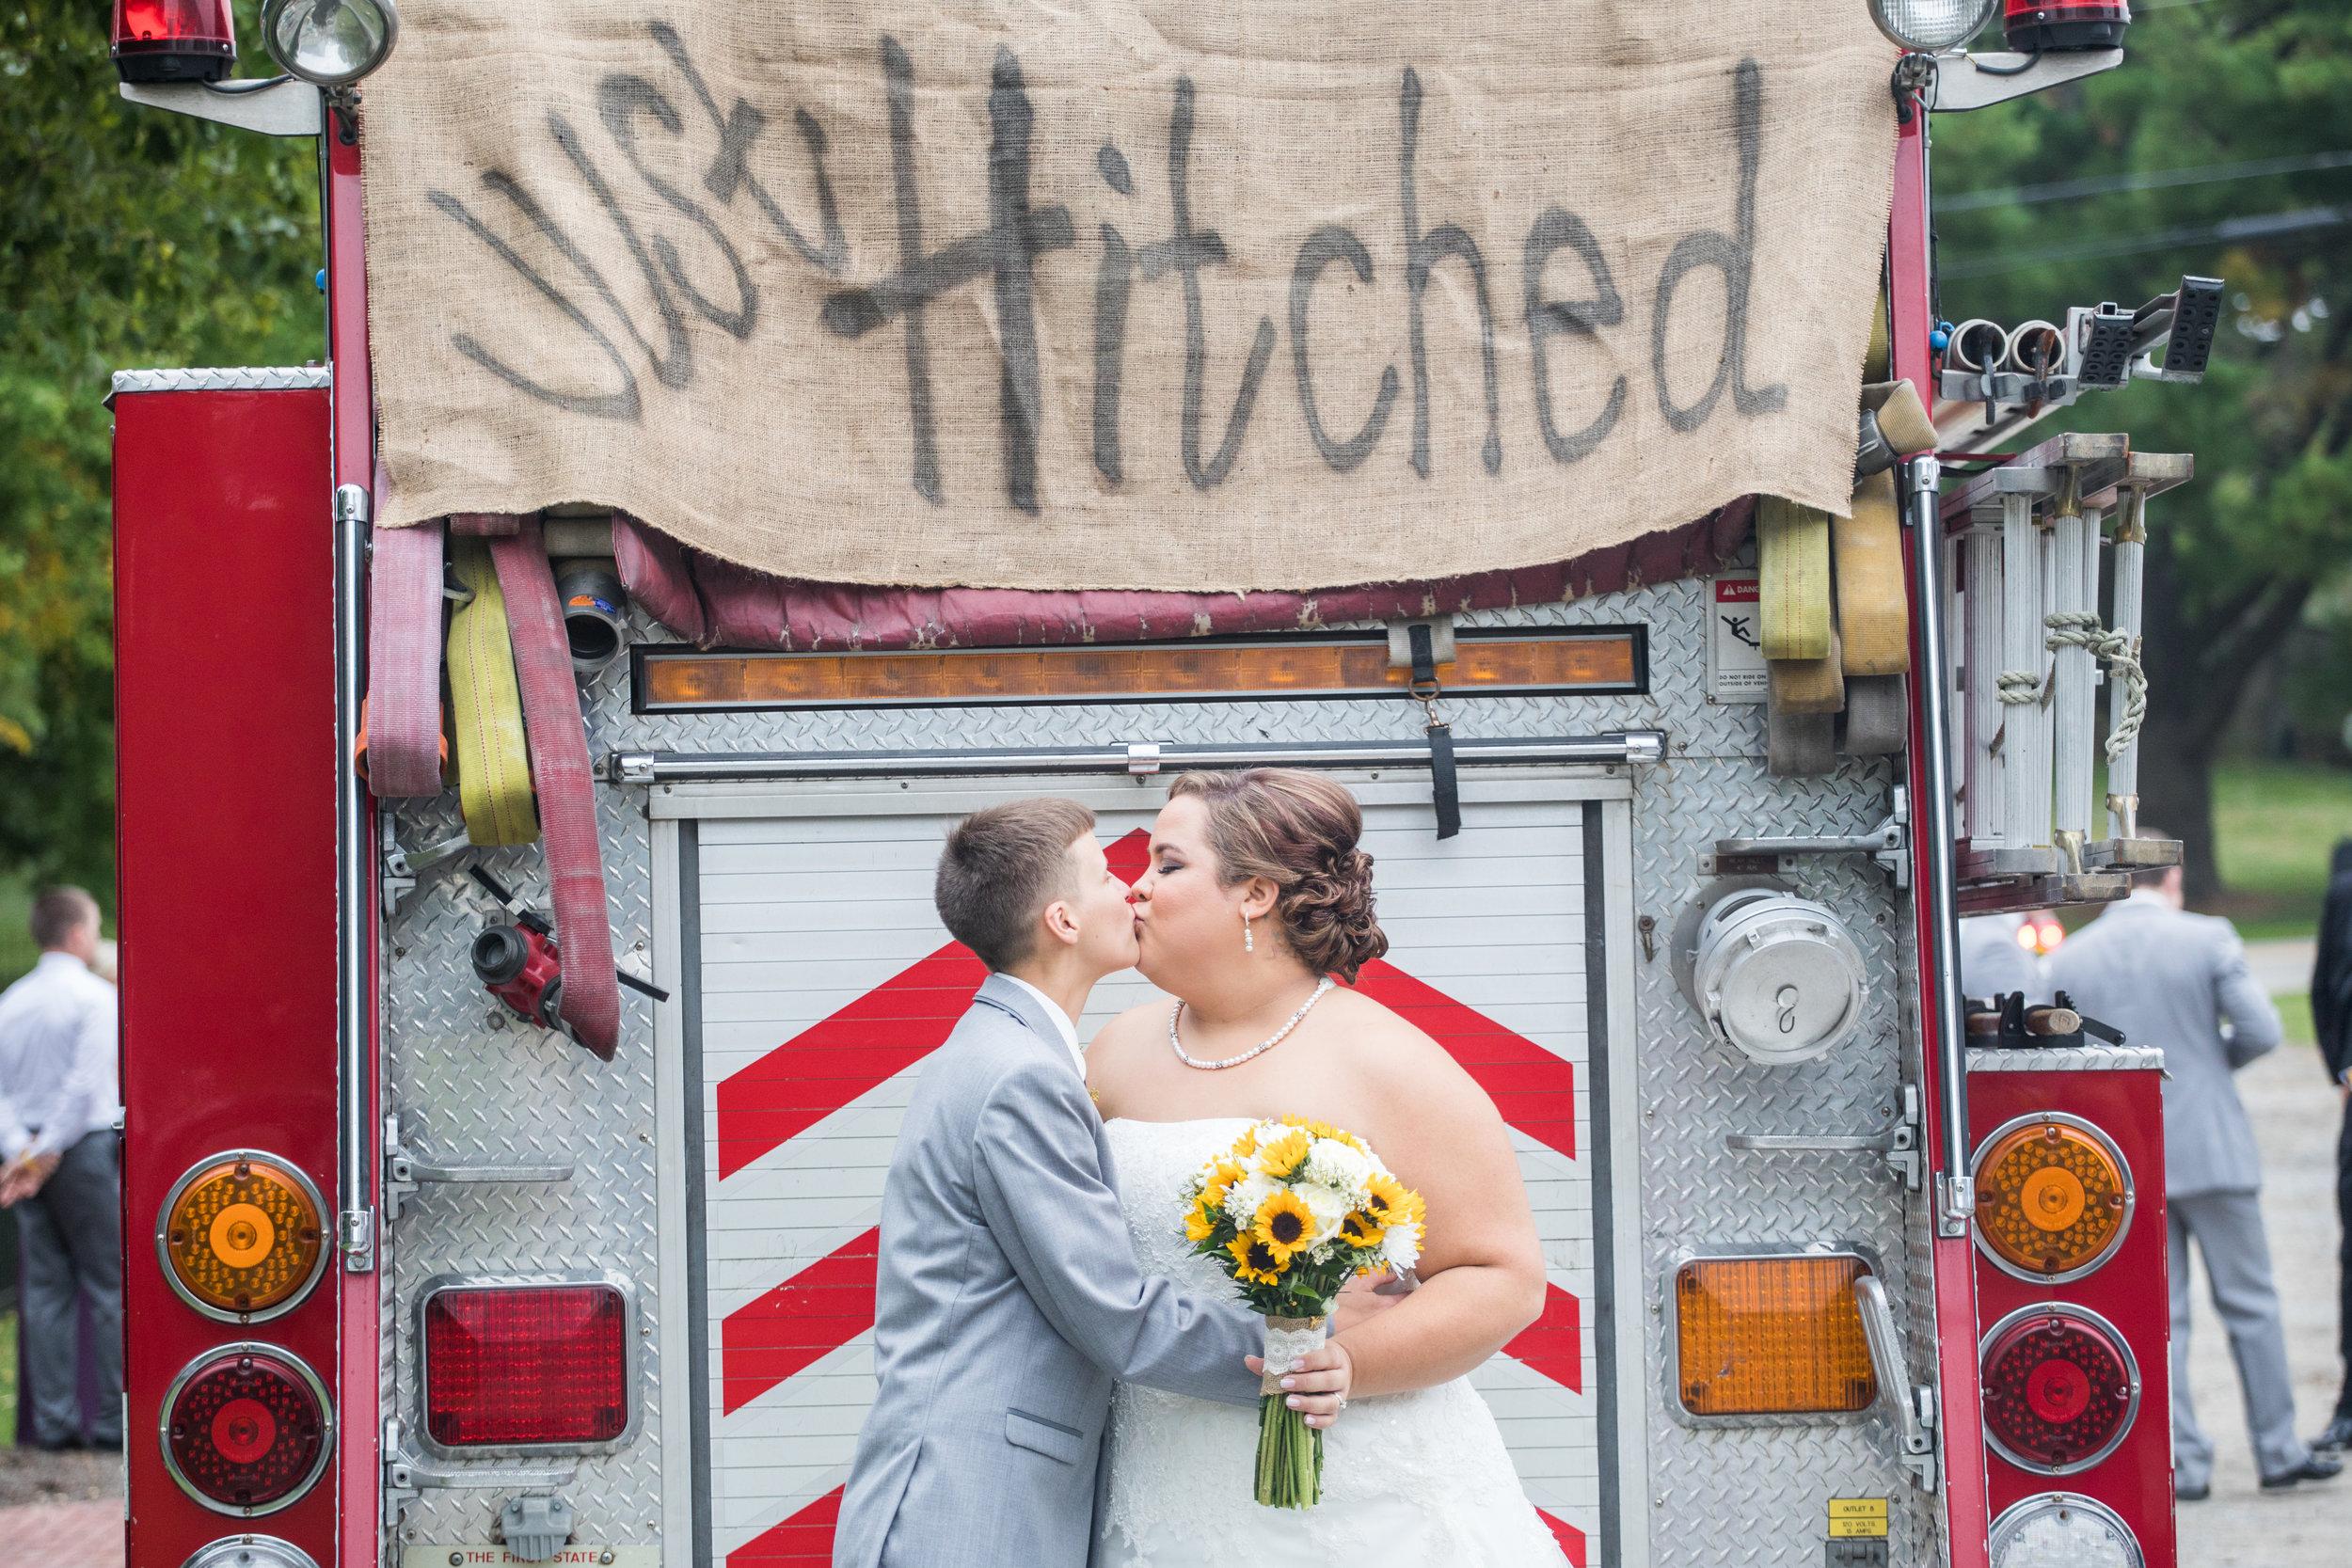 Ceremony_10-8-2016_Errol Ebanks_Becca Cuomo and Brit Witkowski Wedding 10-8-2016_0306.jpg